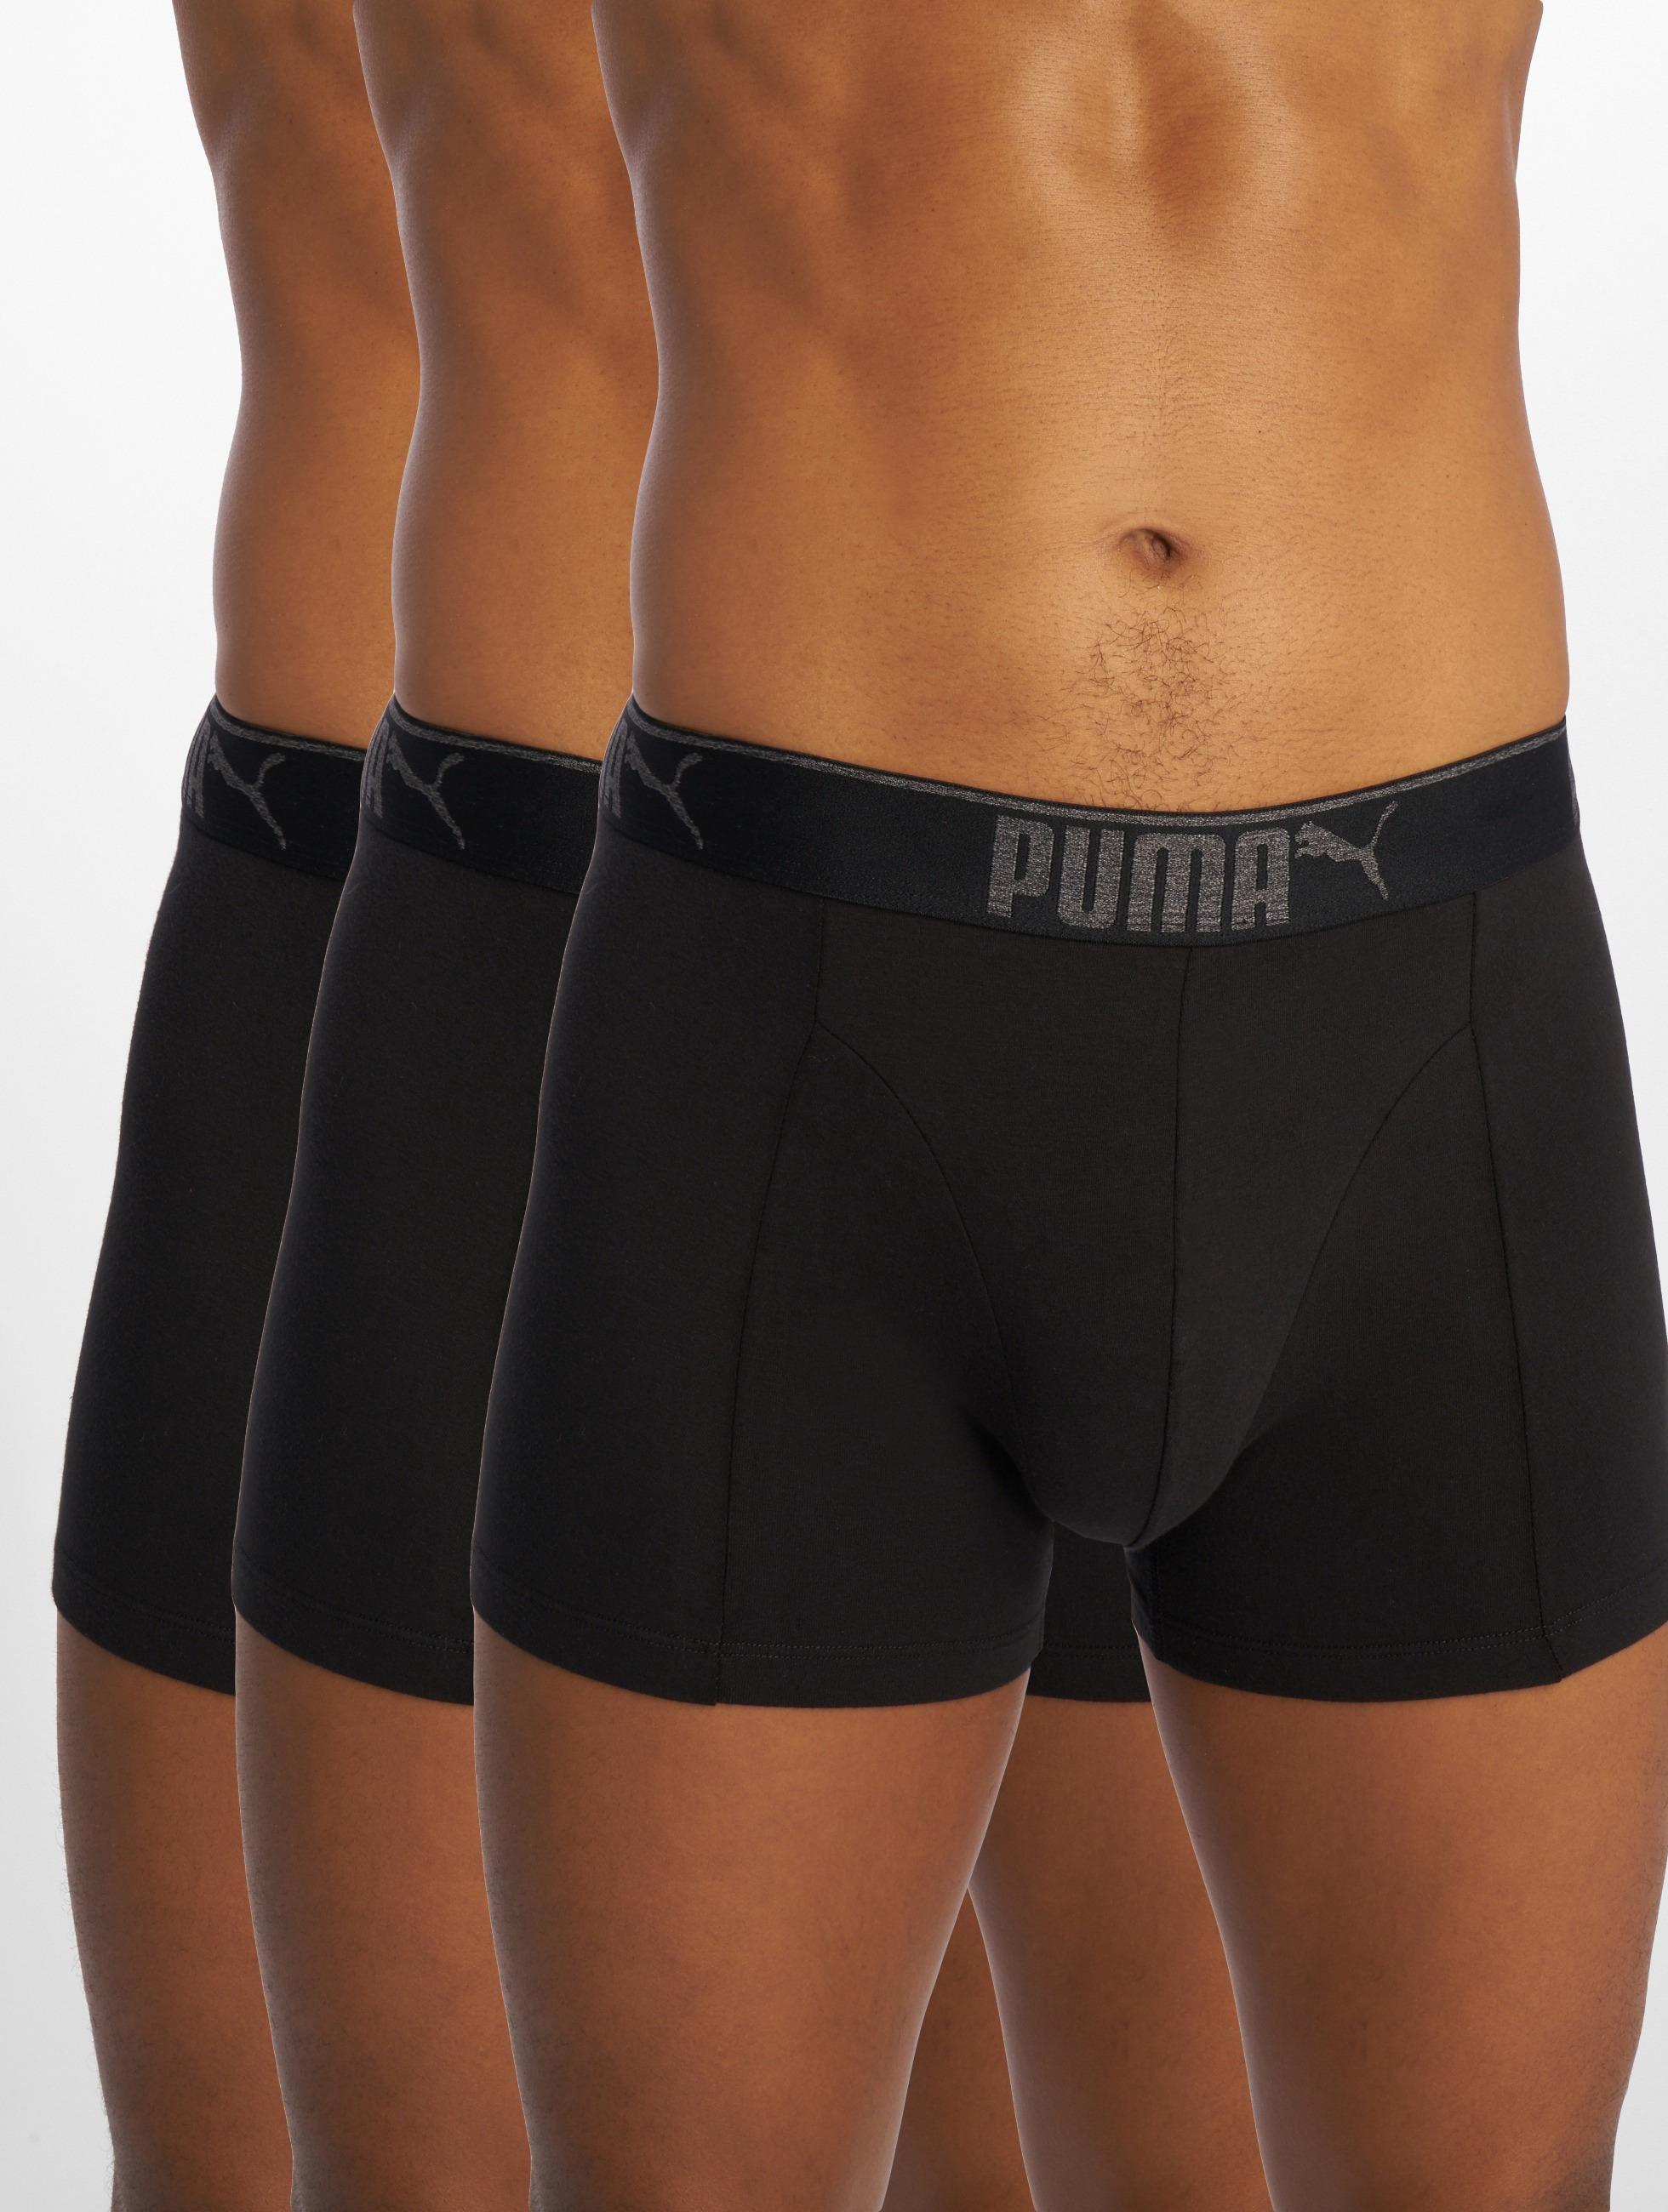 Puma Lifestyle Sueded Cotton 3 Pack Boxershorts Black